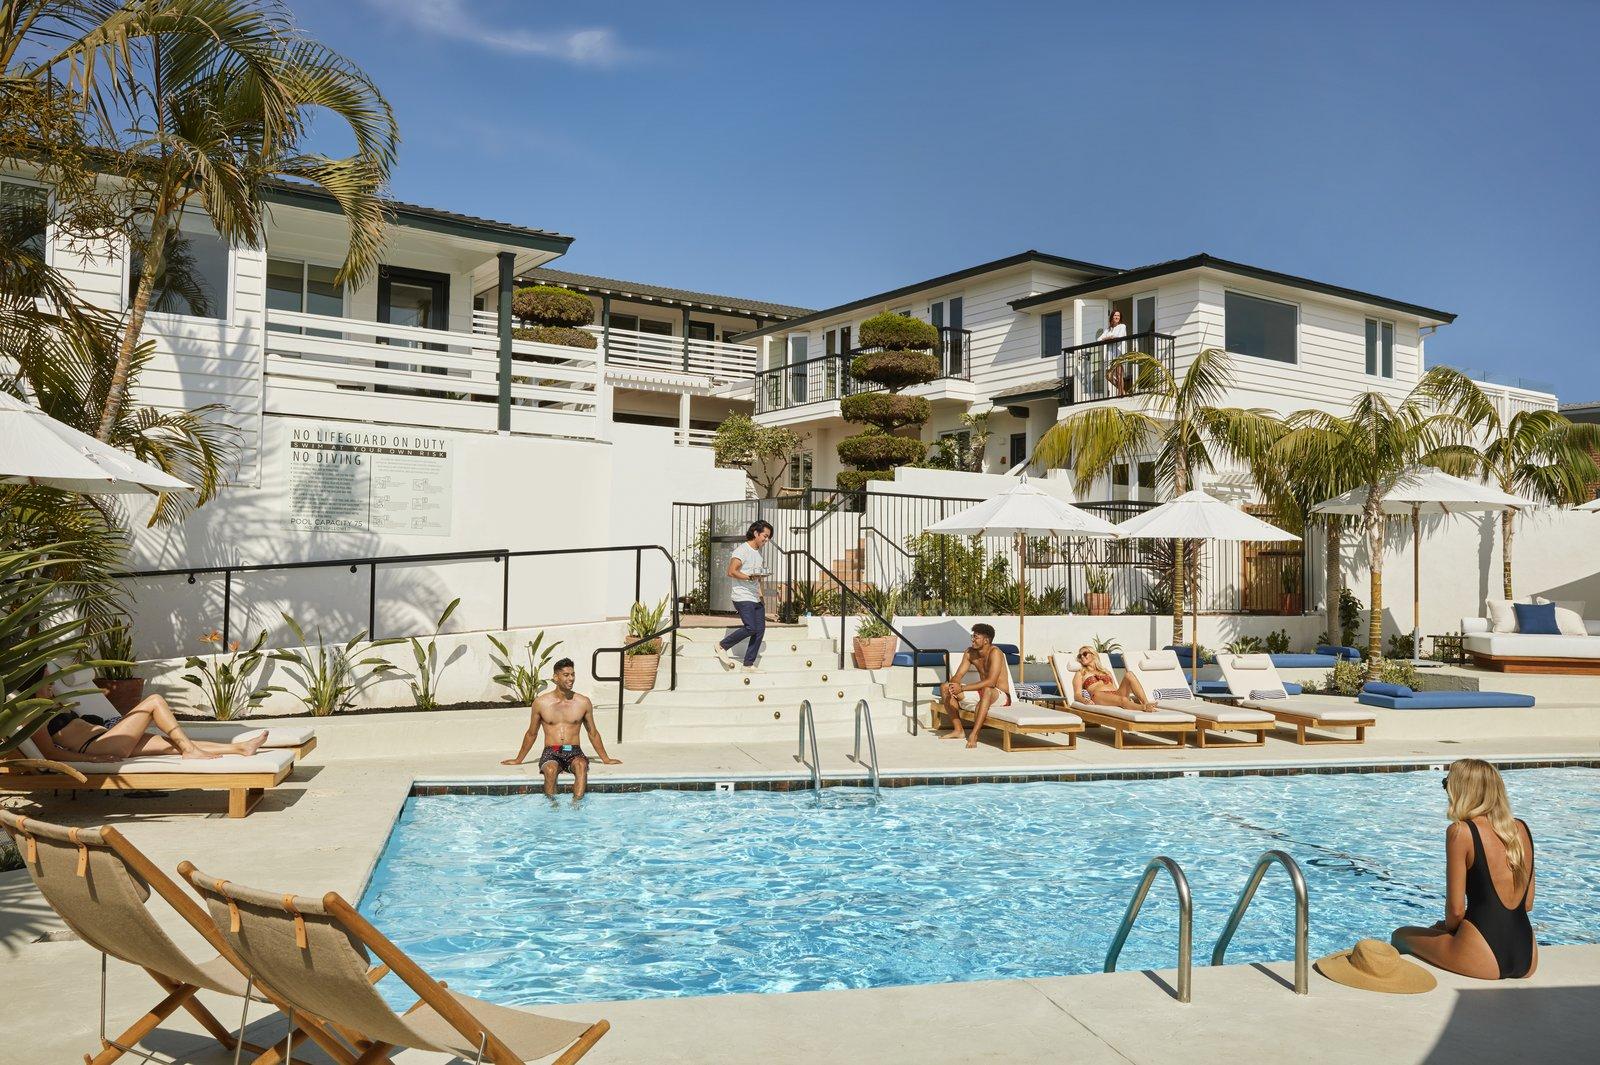 Hotel Joaquin pool